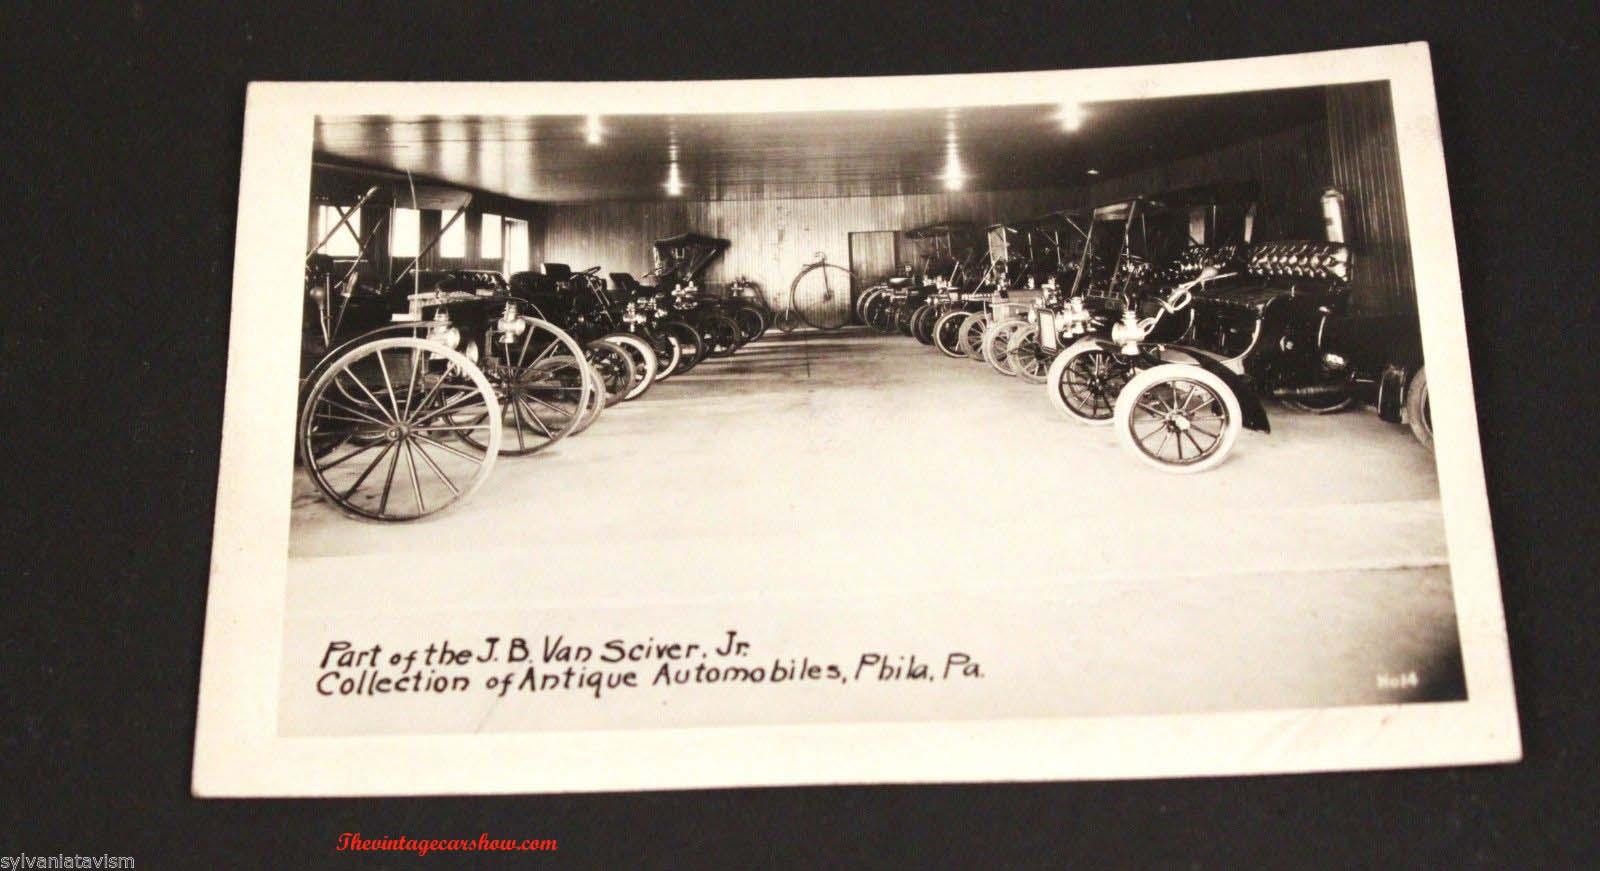 Vintage Cars 1900 | The Vintage Car Show